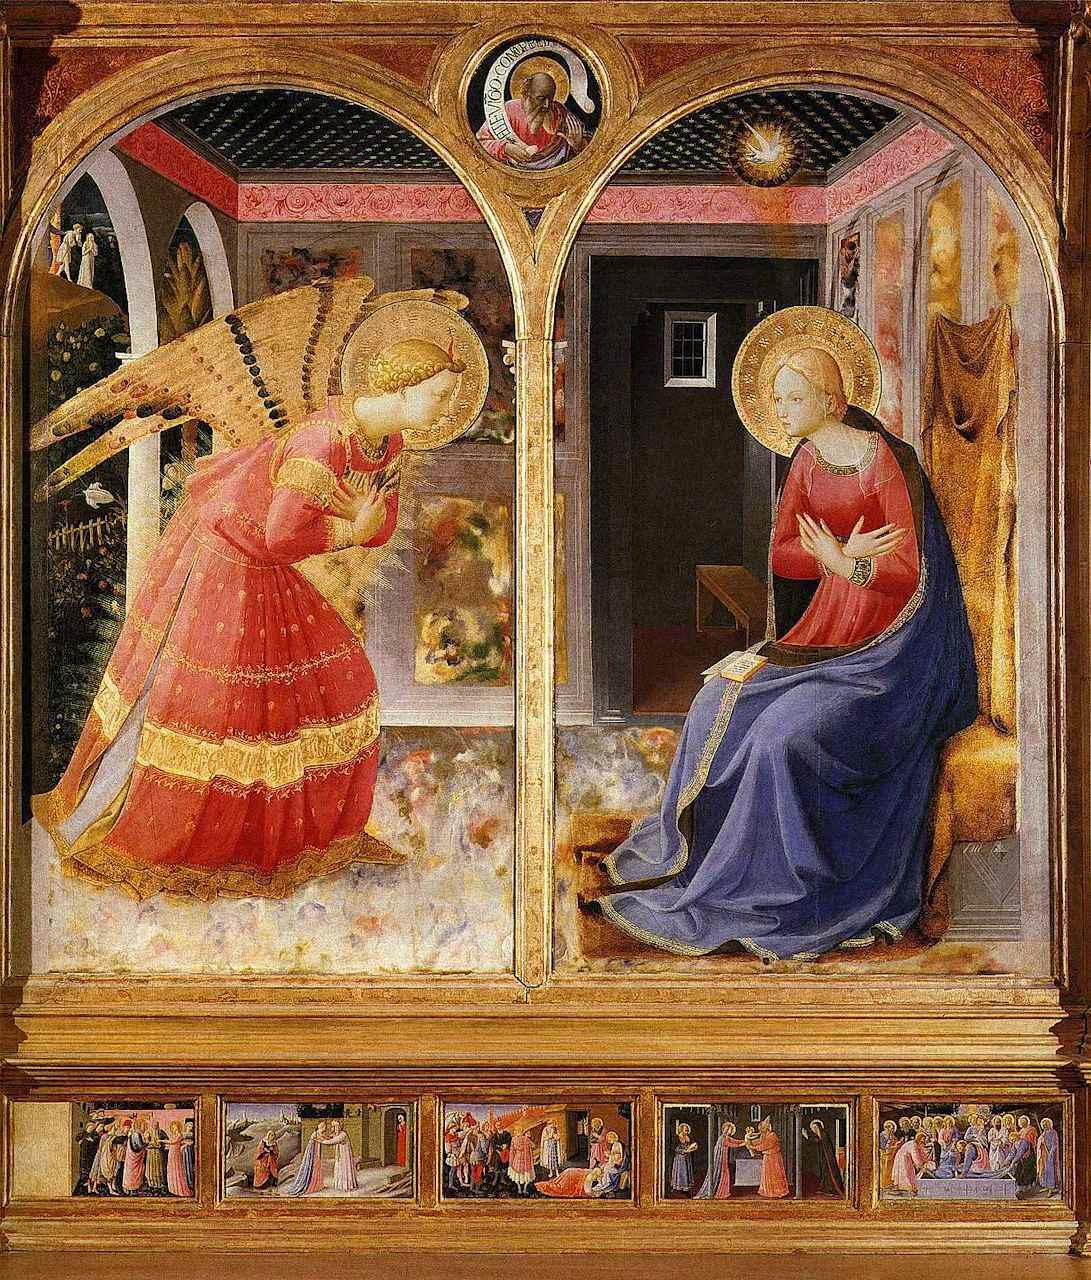 Anunciação, Santa Maria delle Grazie, S. Giovanni Valdarno, Arezzo, Itália. Beato Fra Angélico (1395 – 1455)